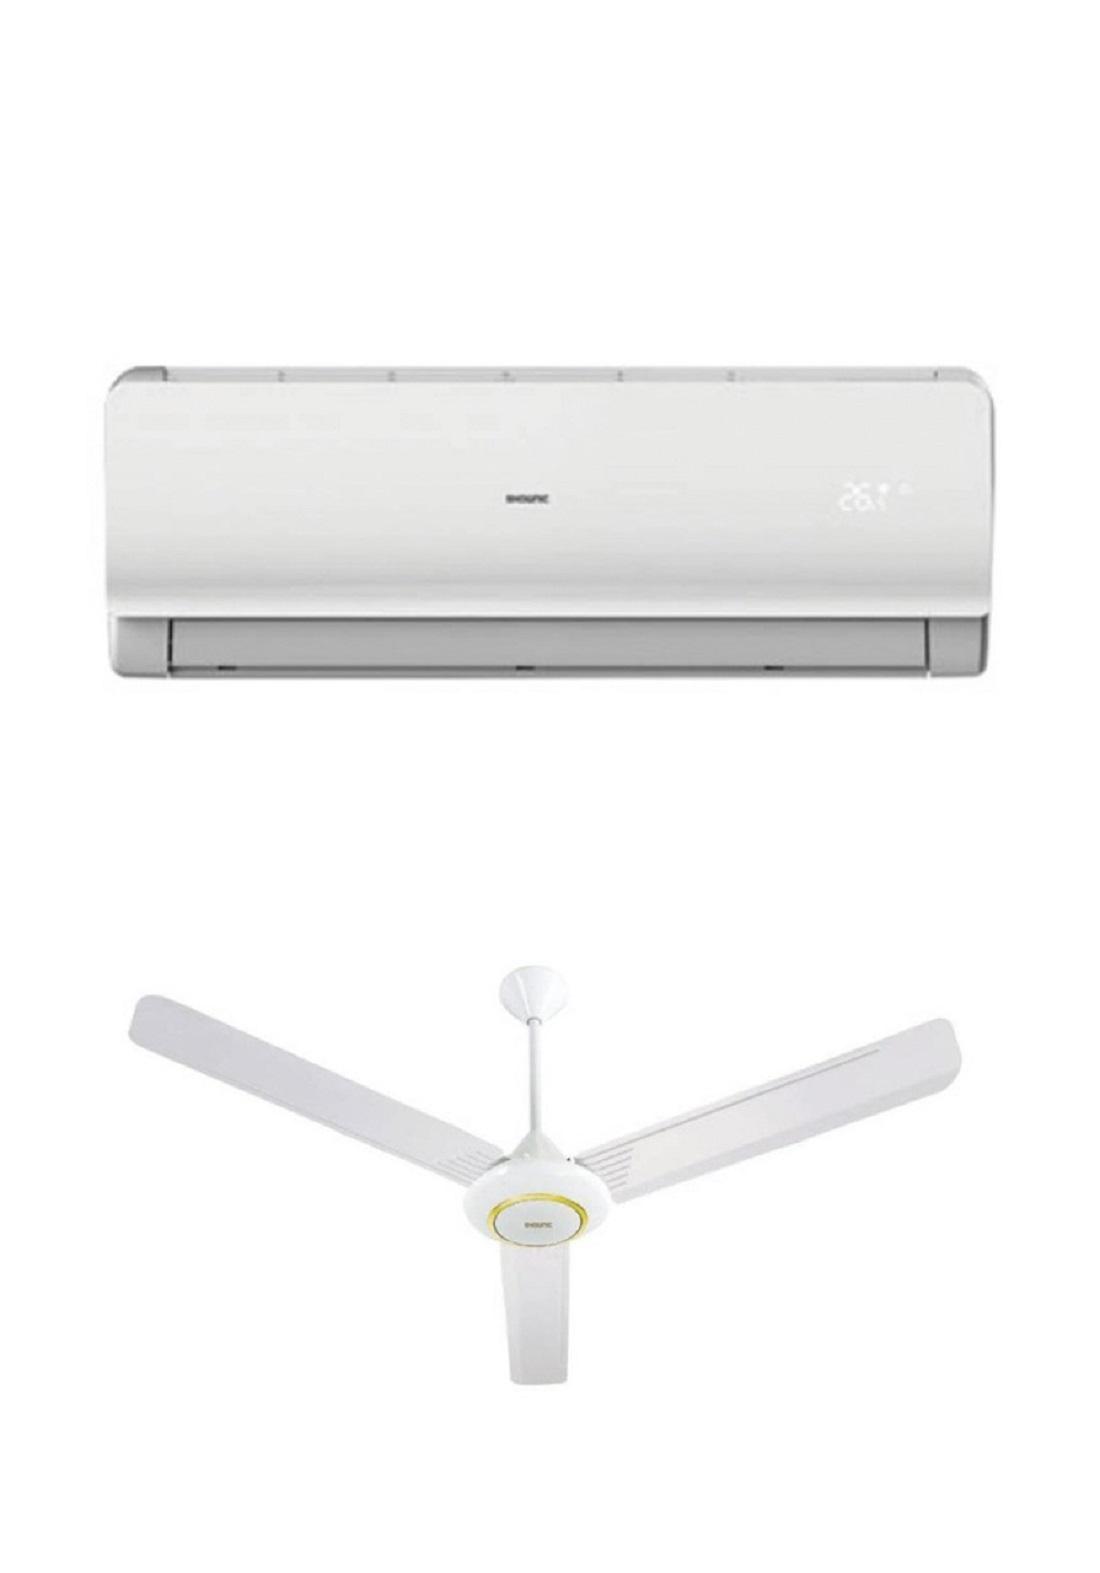 Shownic Split 18K BTU T3 Hot & Cold  Power Line - White عرض سبلت 1.5 طن +مروحة سقفية هدية